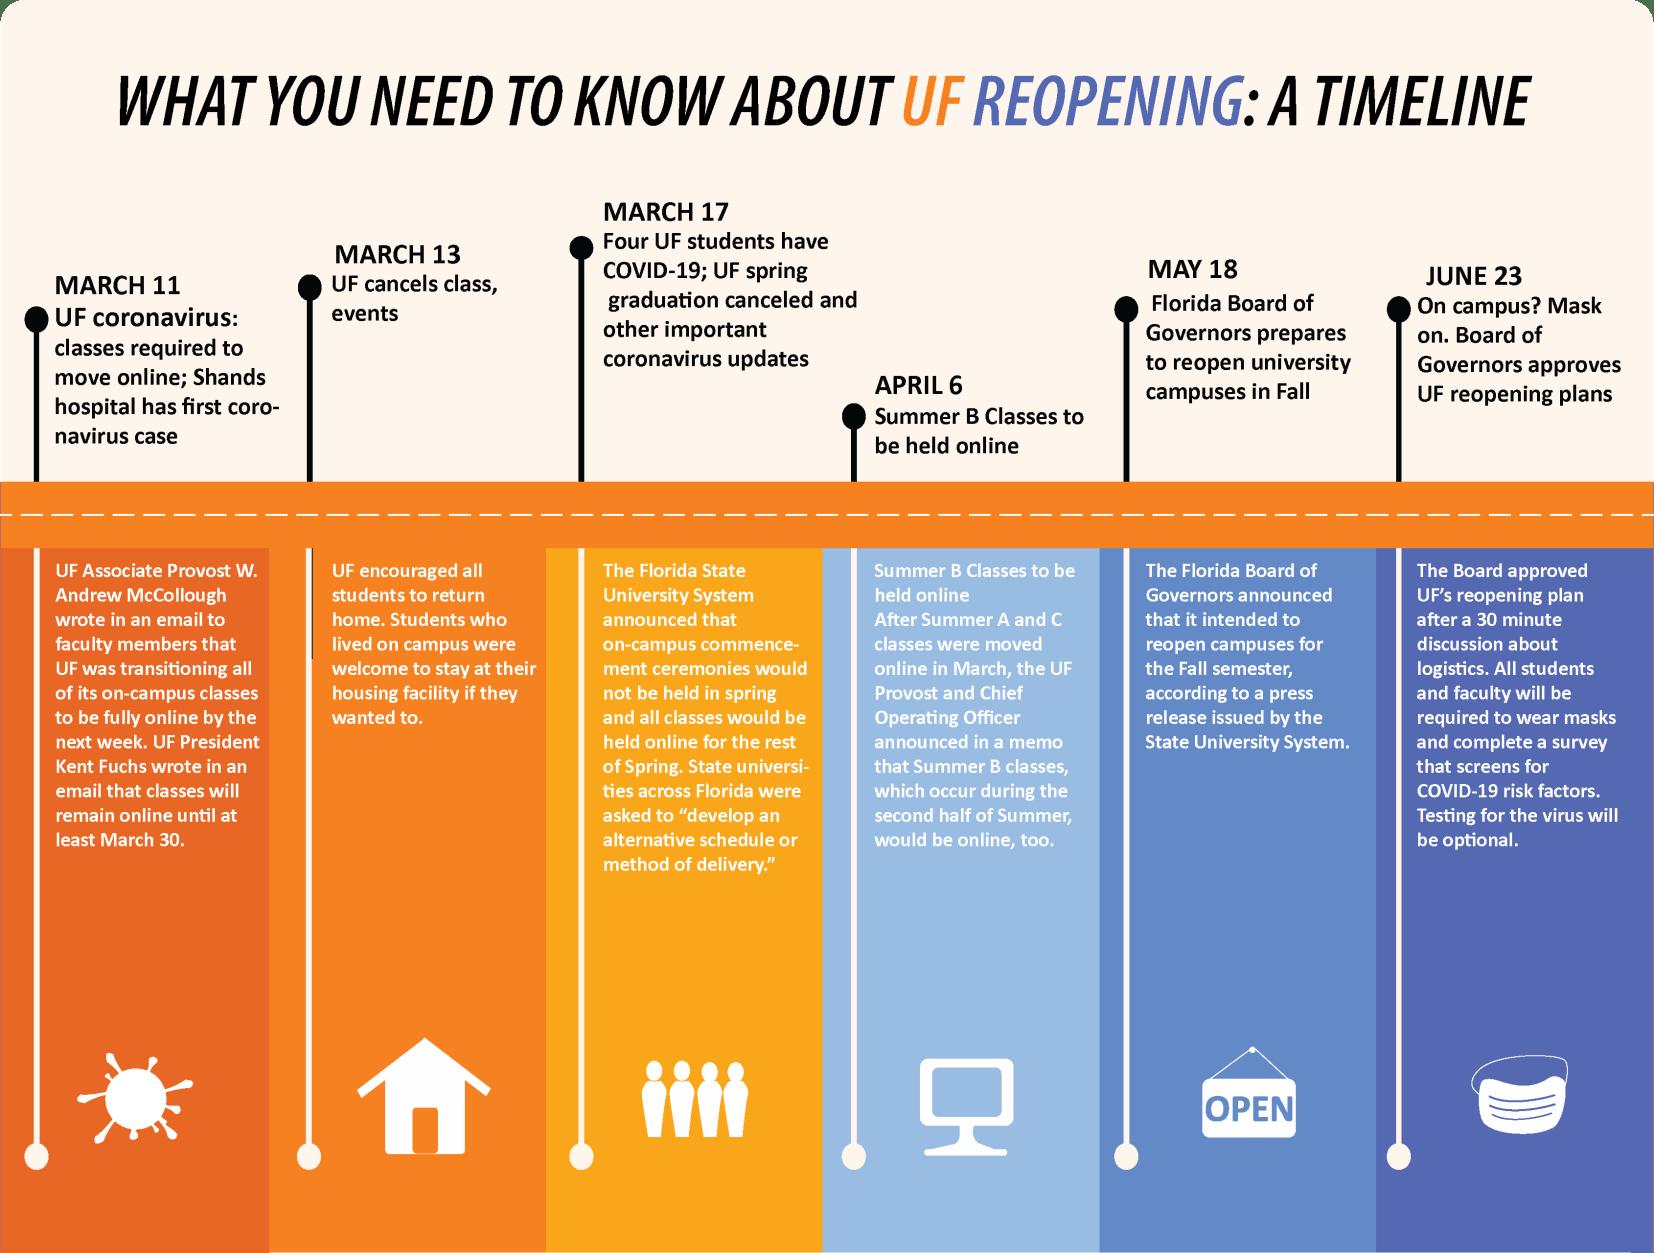 UF Reopening timeline